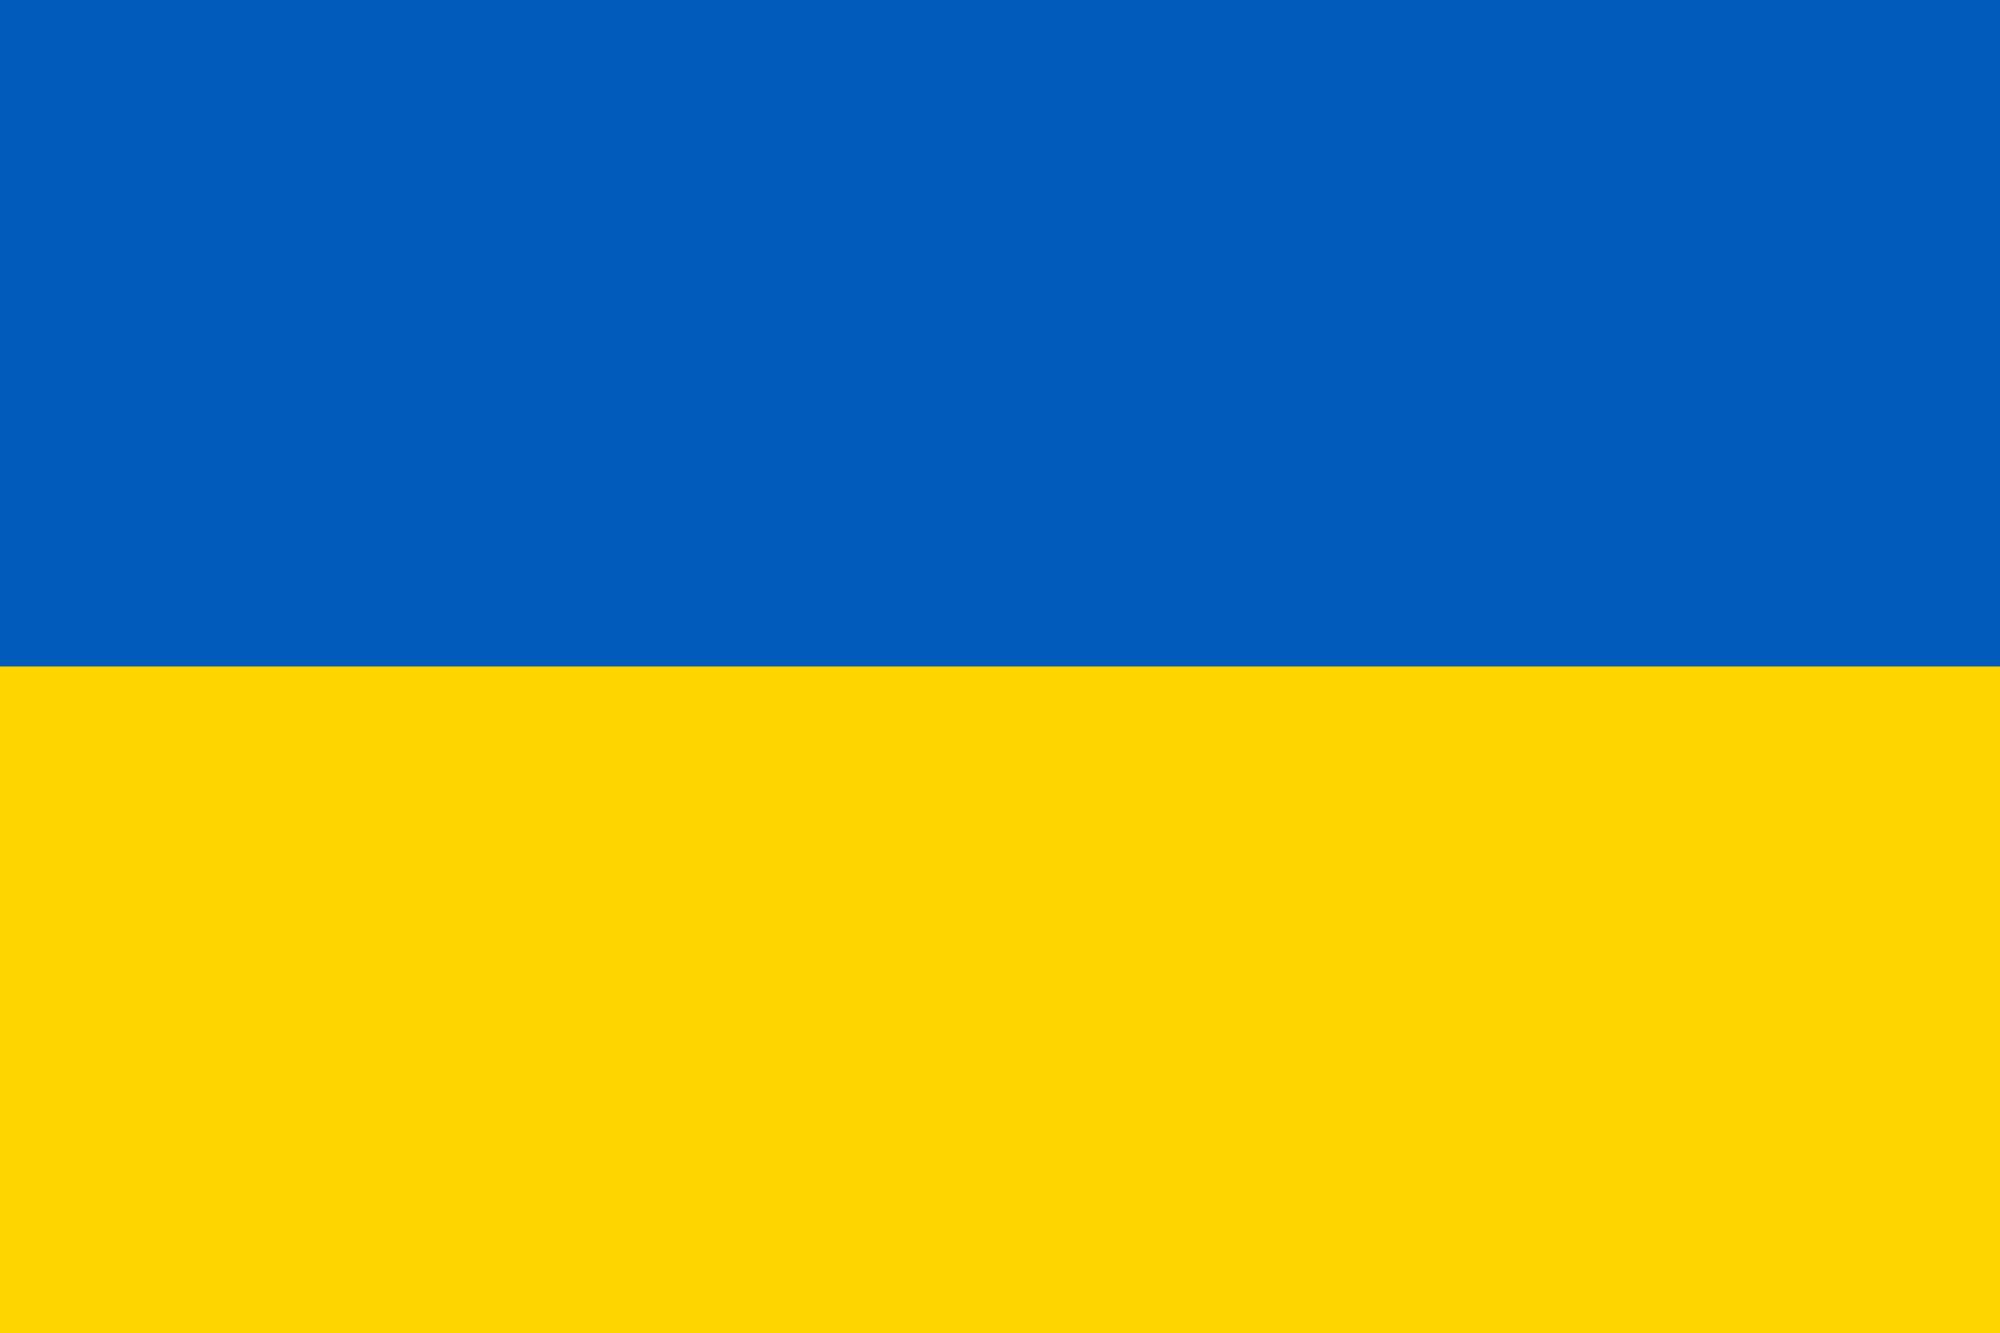 Ukrainian flag PNG